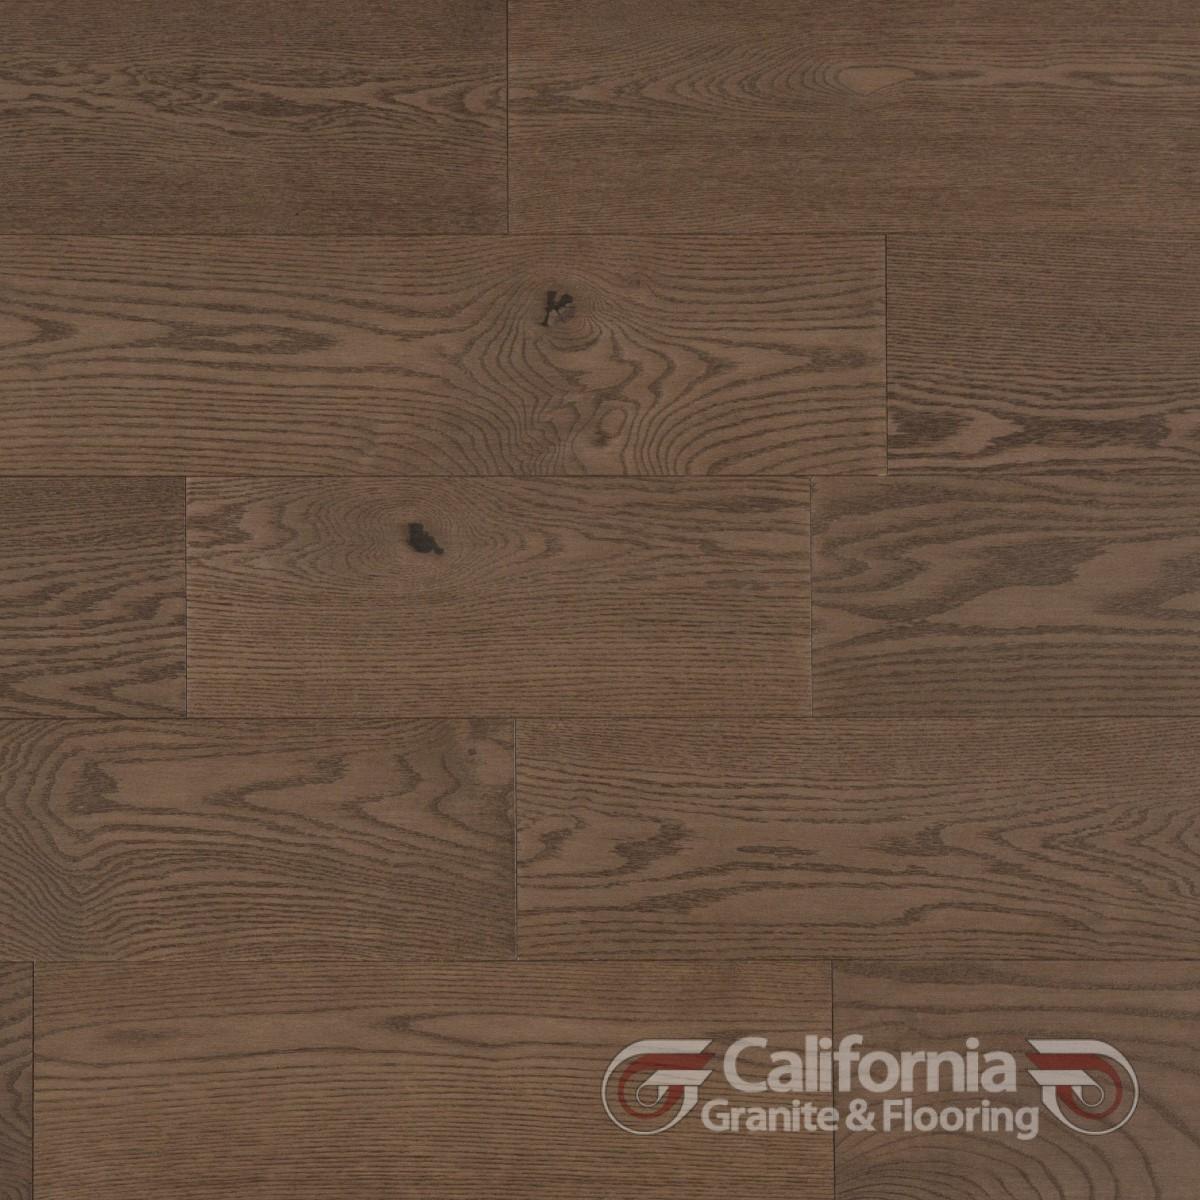 hardwood-flooring-red-oak-tree-house-character-brushed-2